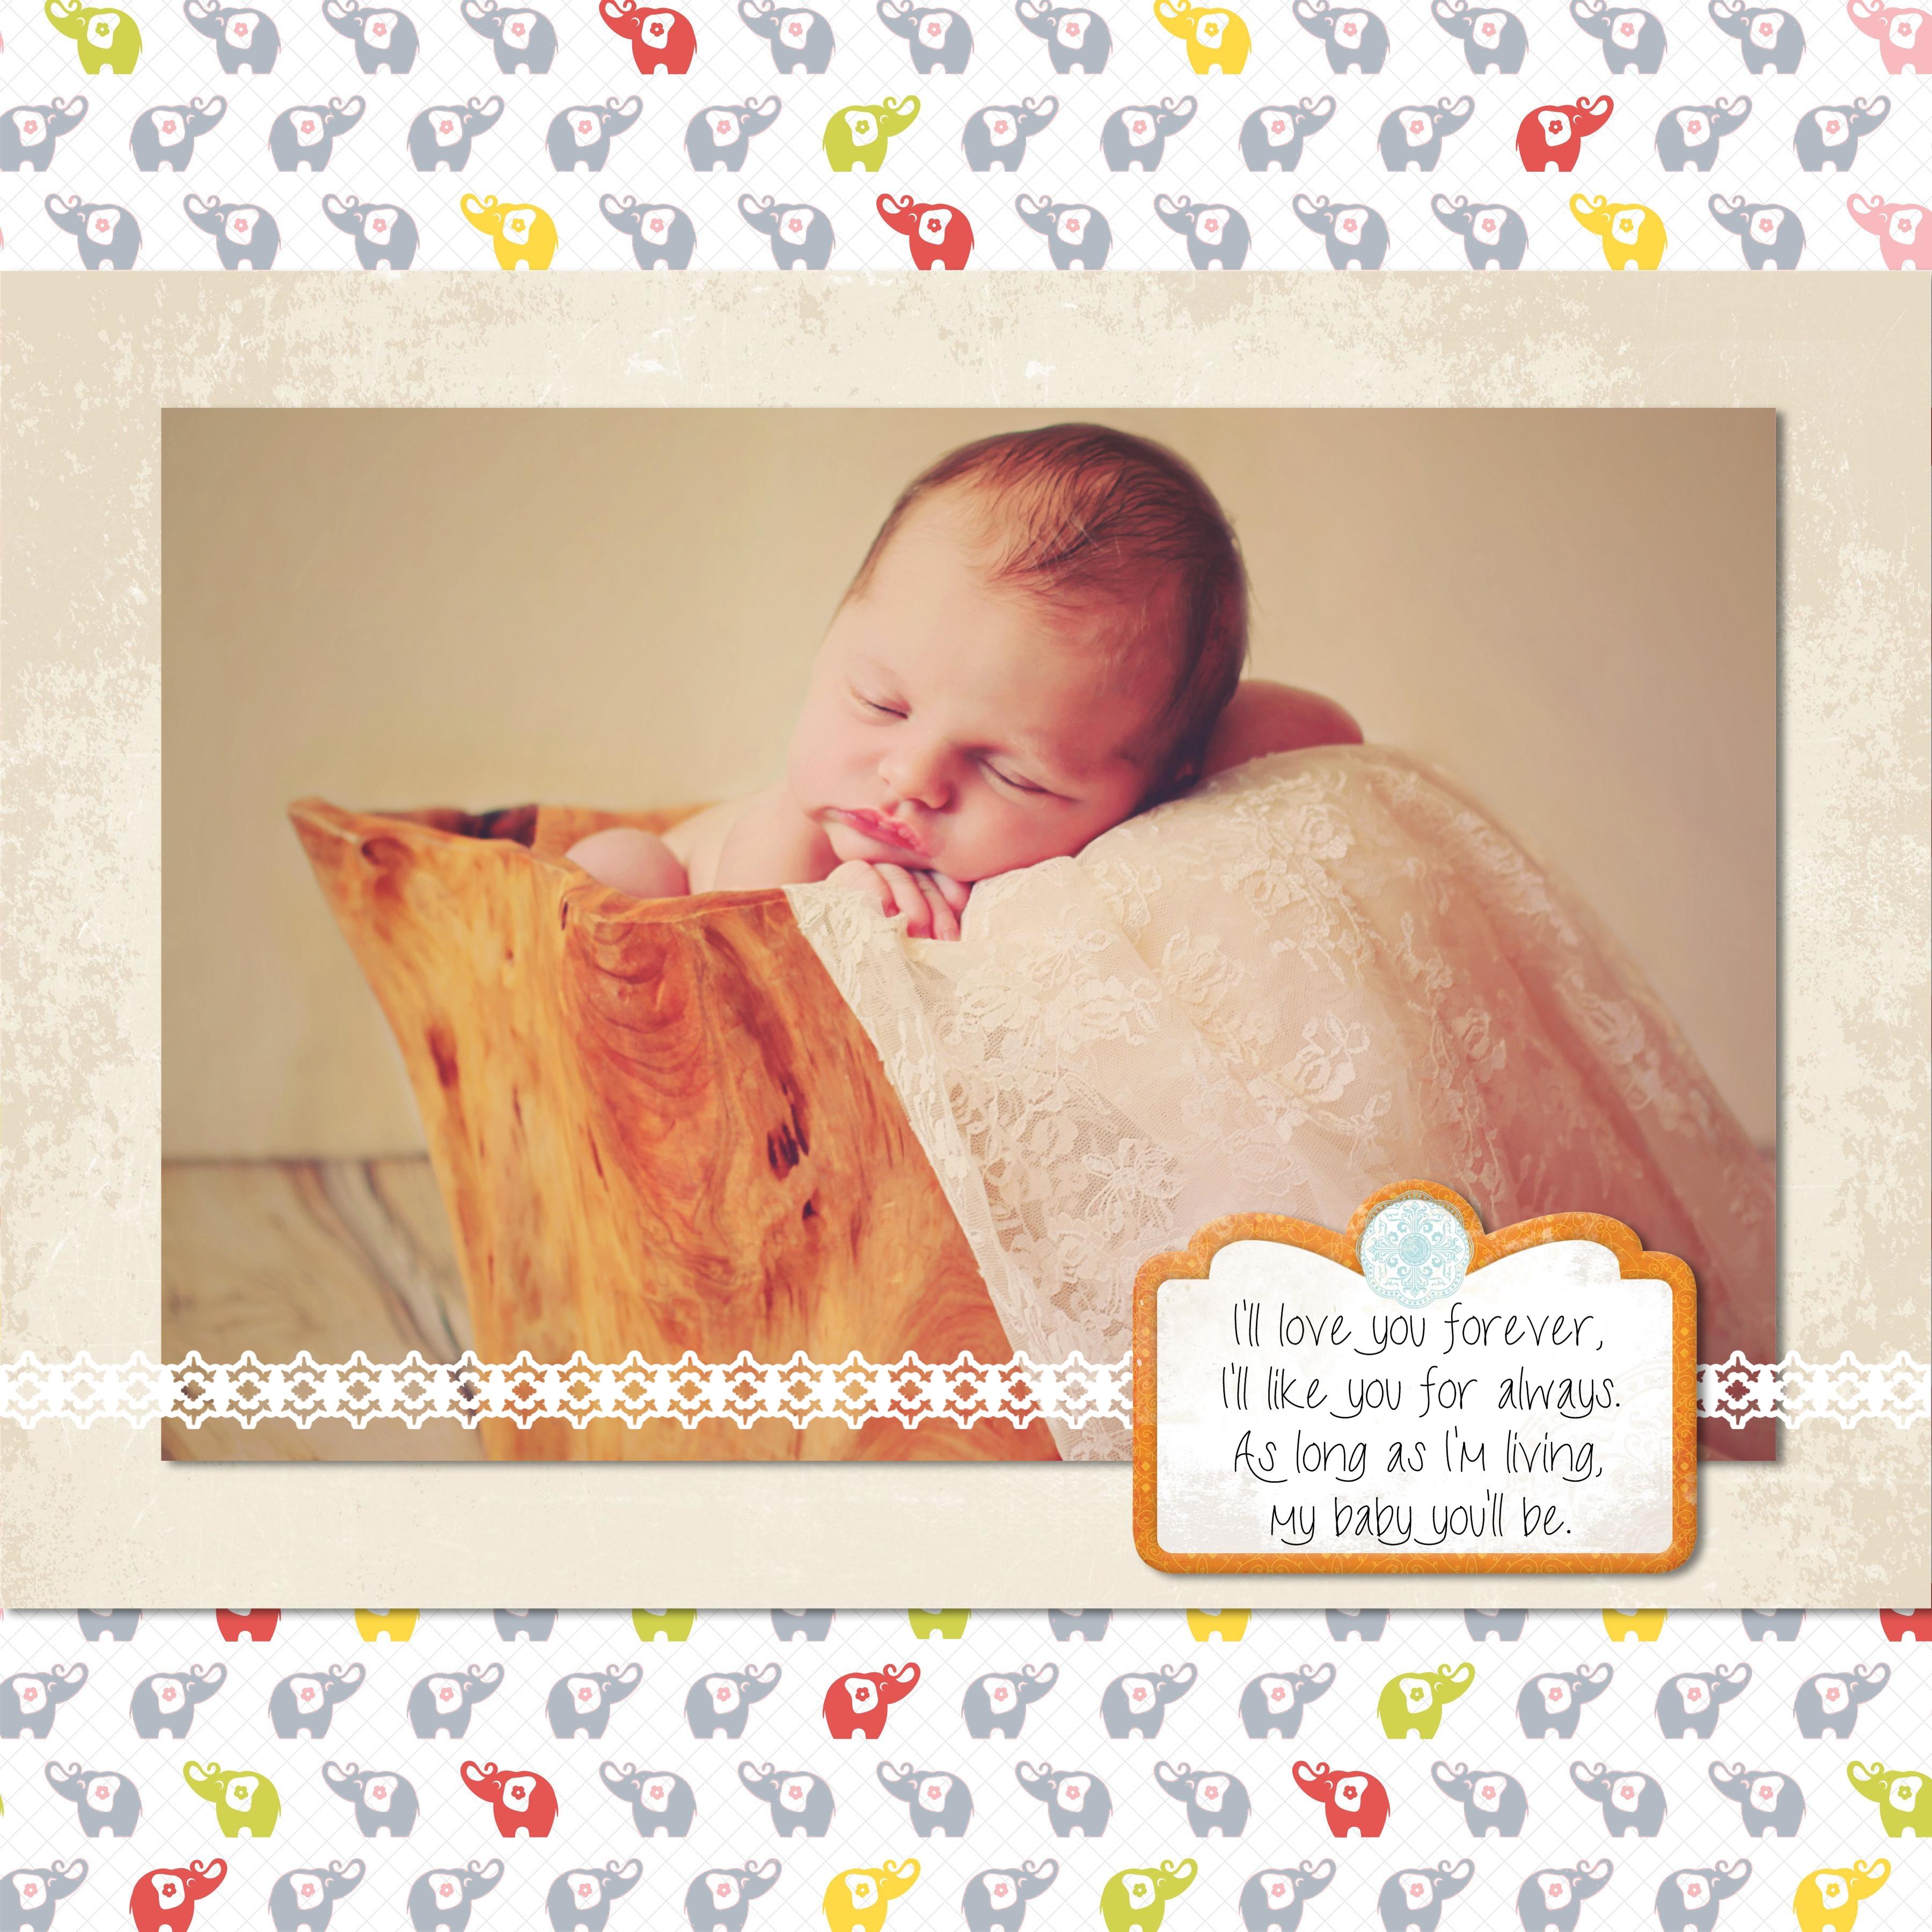 BabyBoy - Page 006.jpg